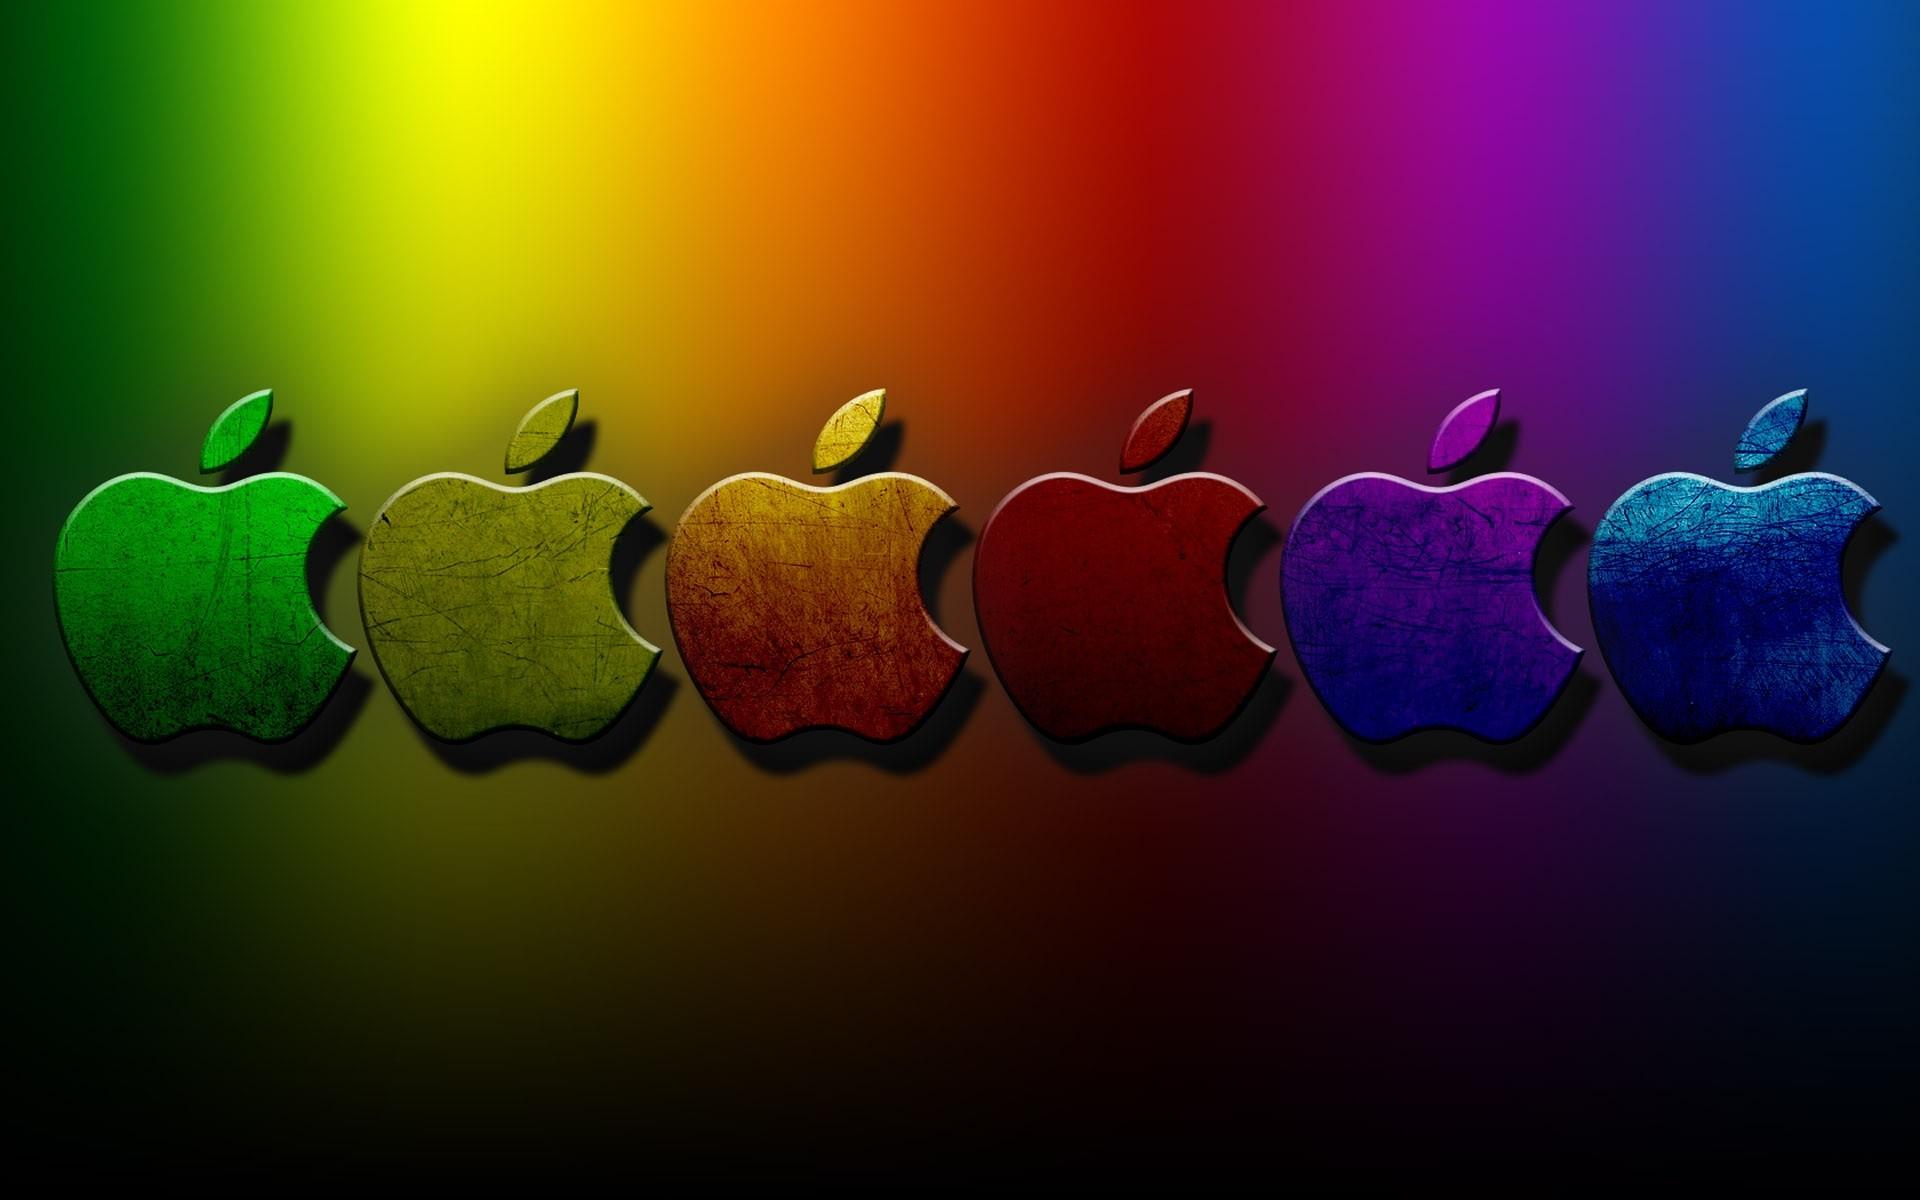 Res: 1920x1200, 3D Apple Colorful Wallpaper.